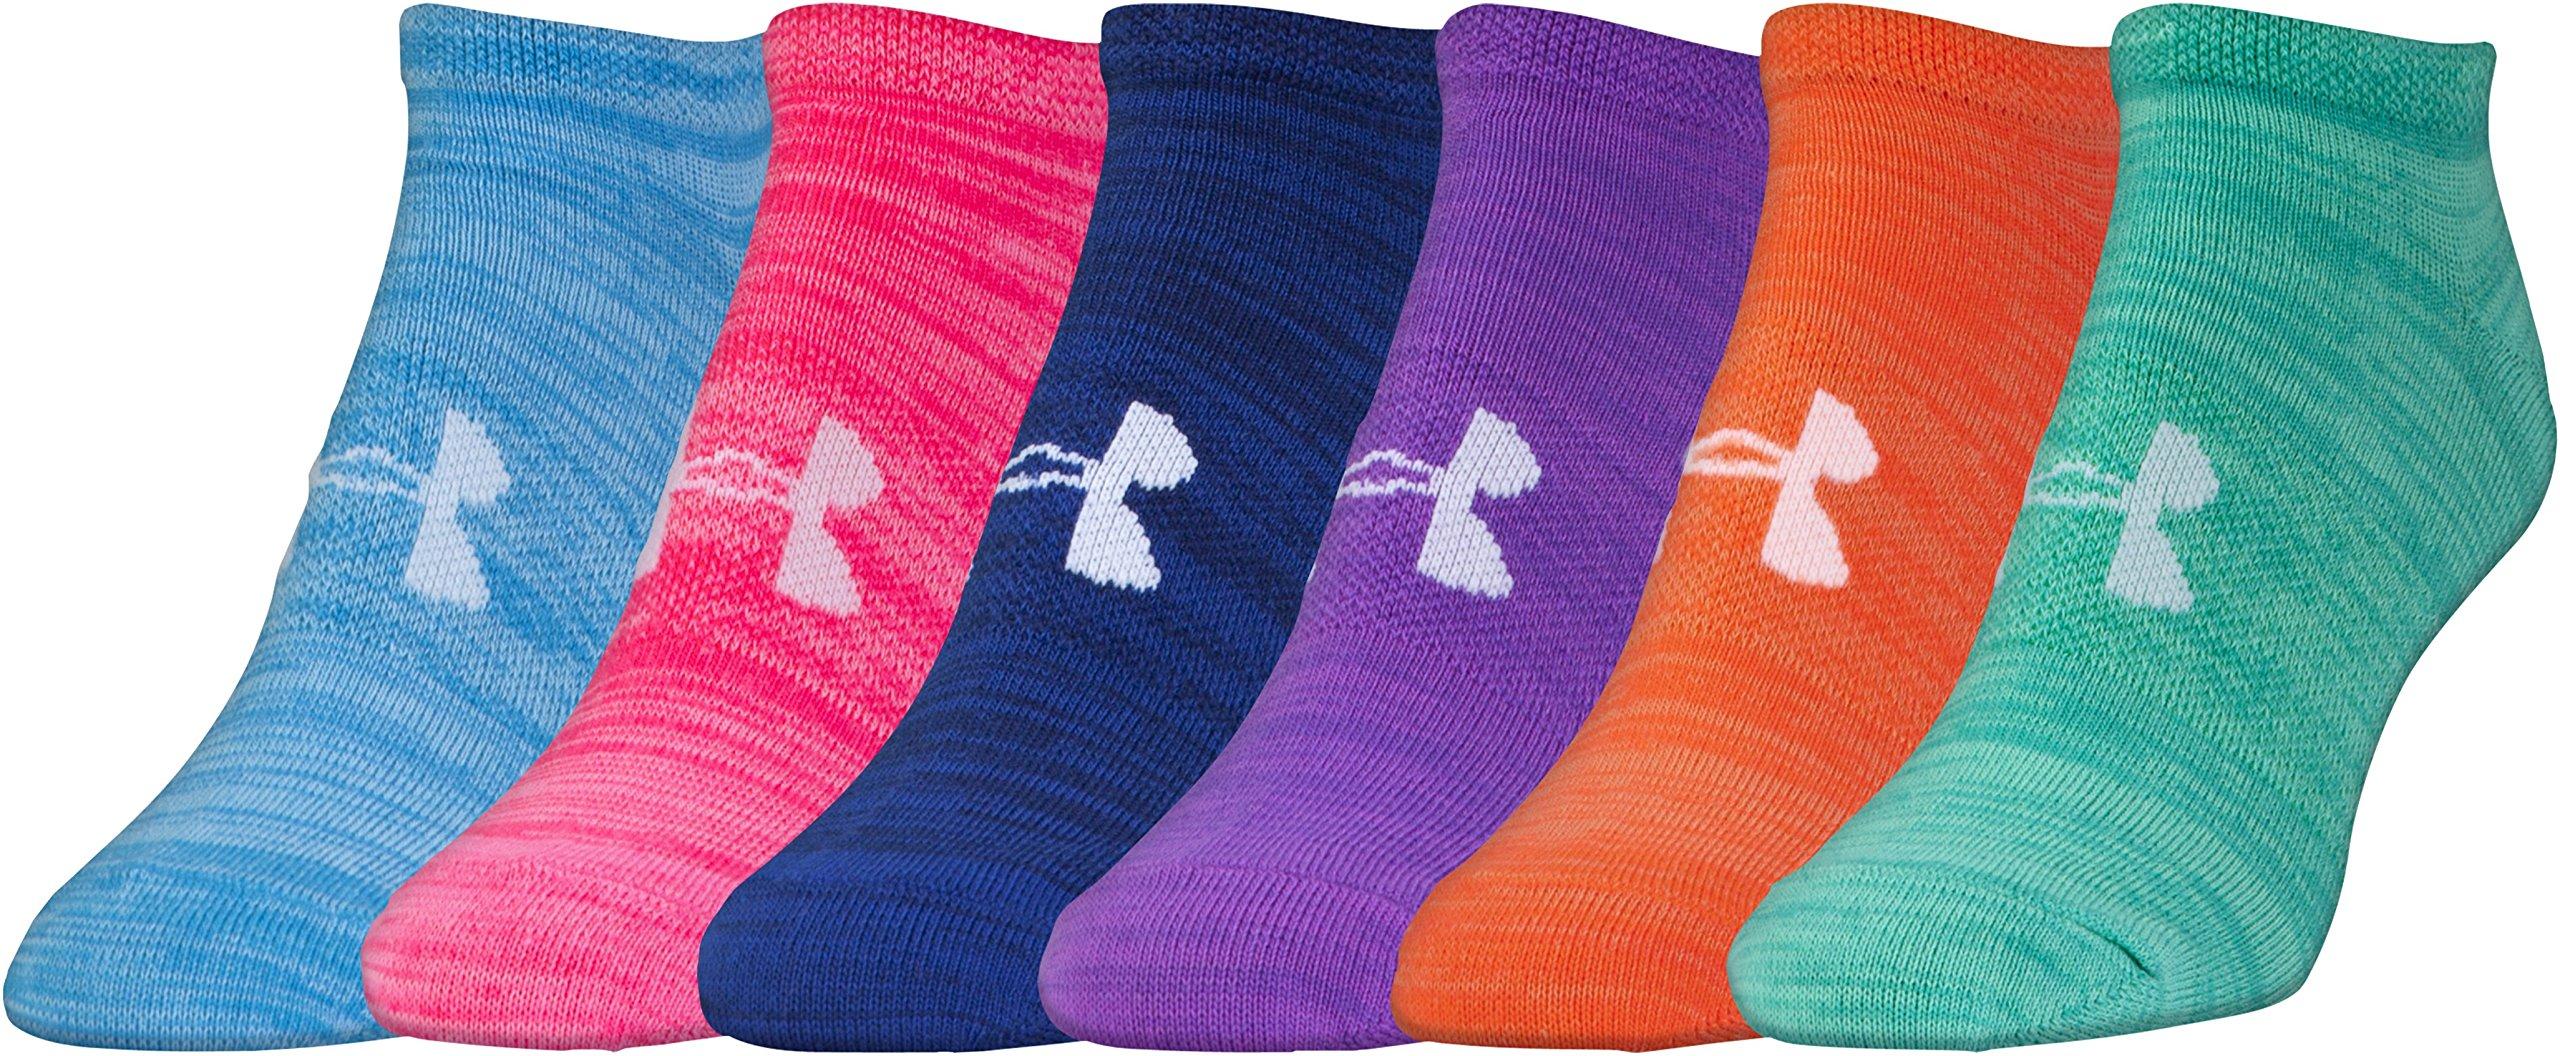 Under Armour Women's Essential Twist No Show Socks (6 Pack), Bright Assortment, Medium